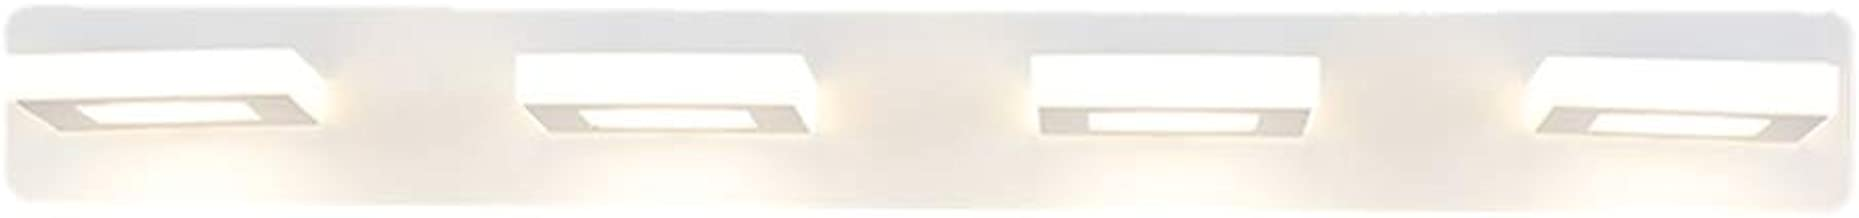 JIY Mirror Headlight Simple Creative Personality leidde wandlamp Badkamer spiegelcabinet kaptafel Lamp Waterdicht en anti-...